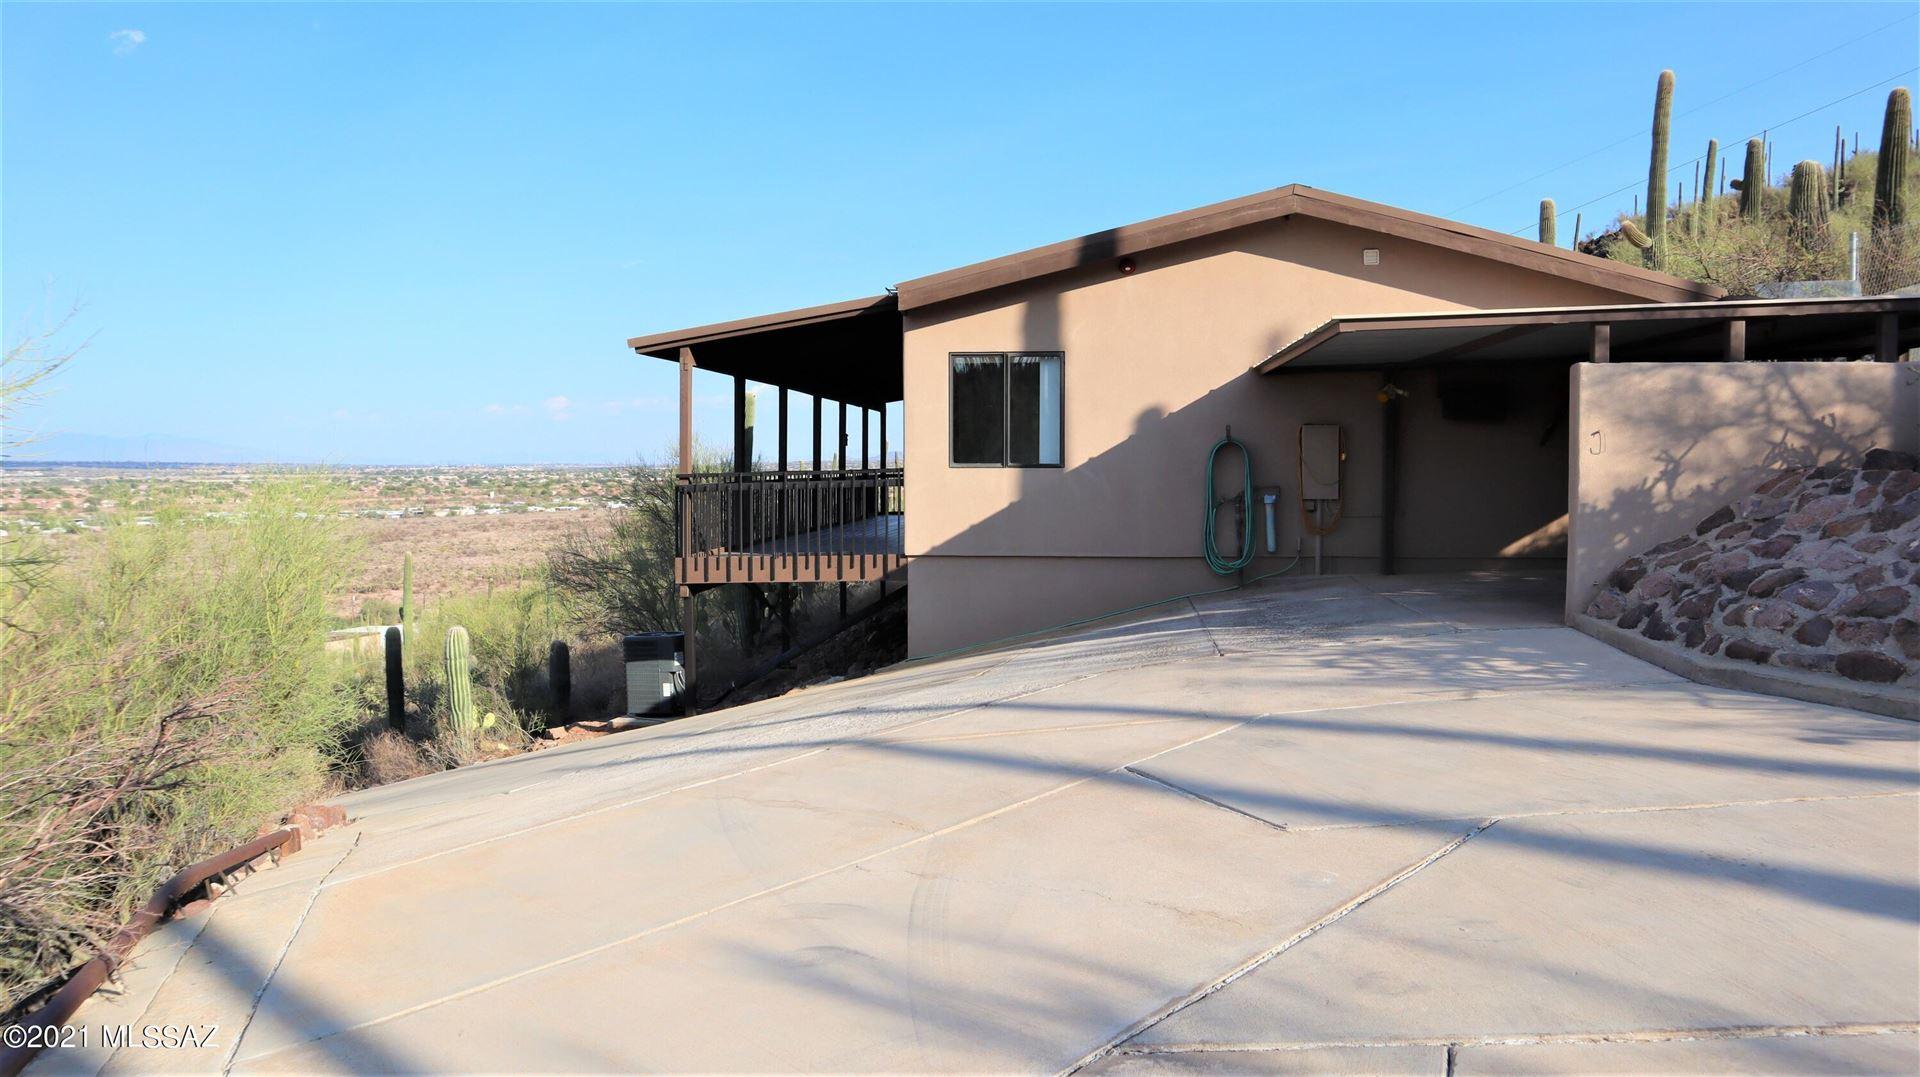 10075 N Silverbell Road, Tucson, AZ 85743 - MLS#: 22117786